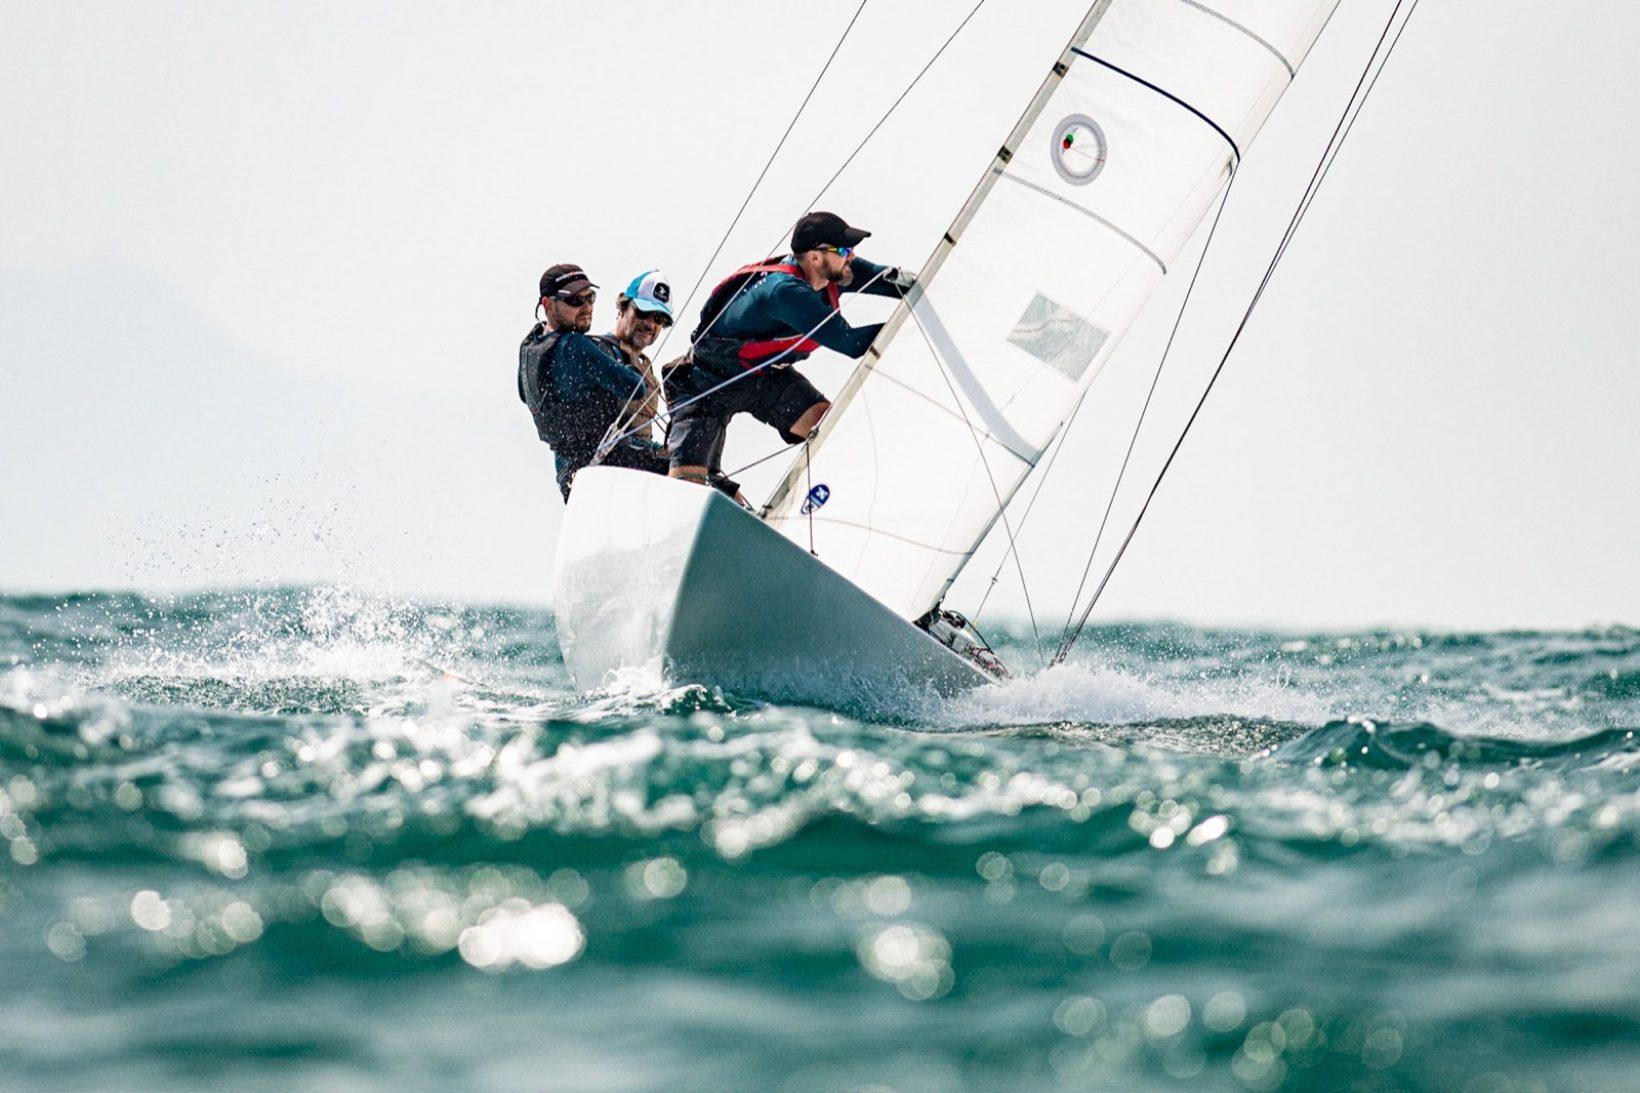 Swiss sailor elected Commodore of the Royal Yacht Club of Hong Kong